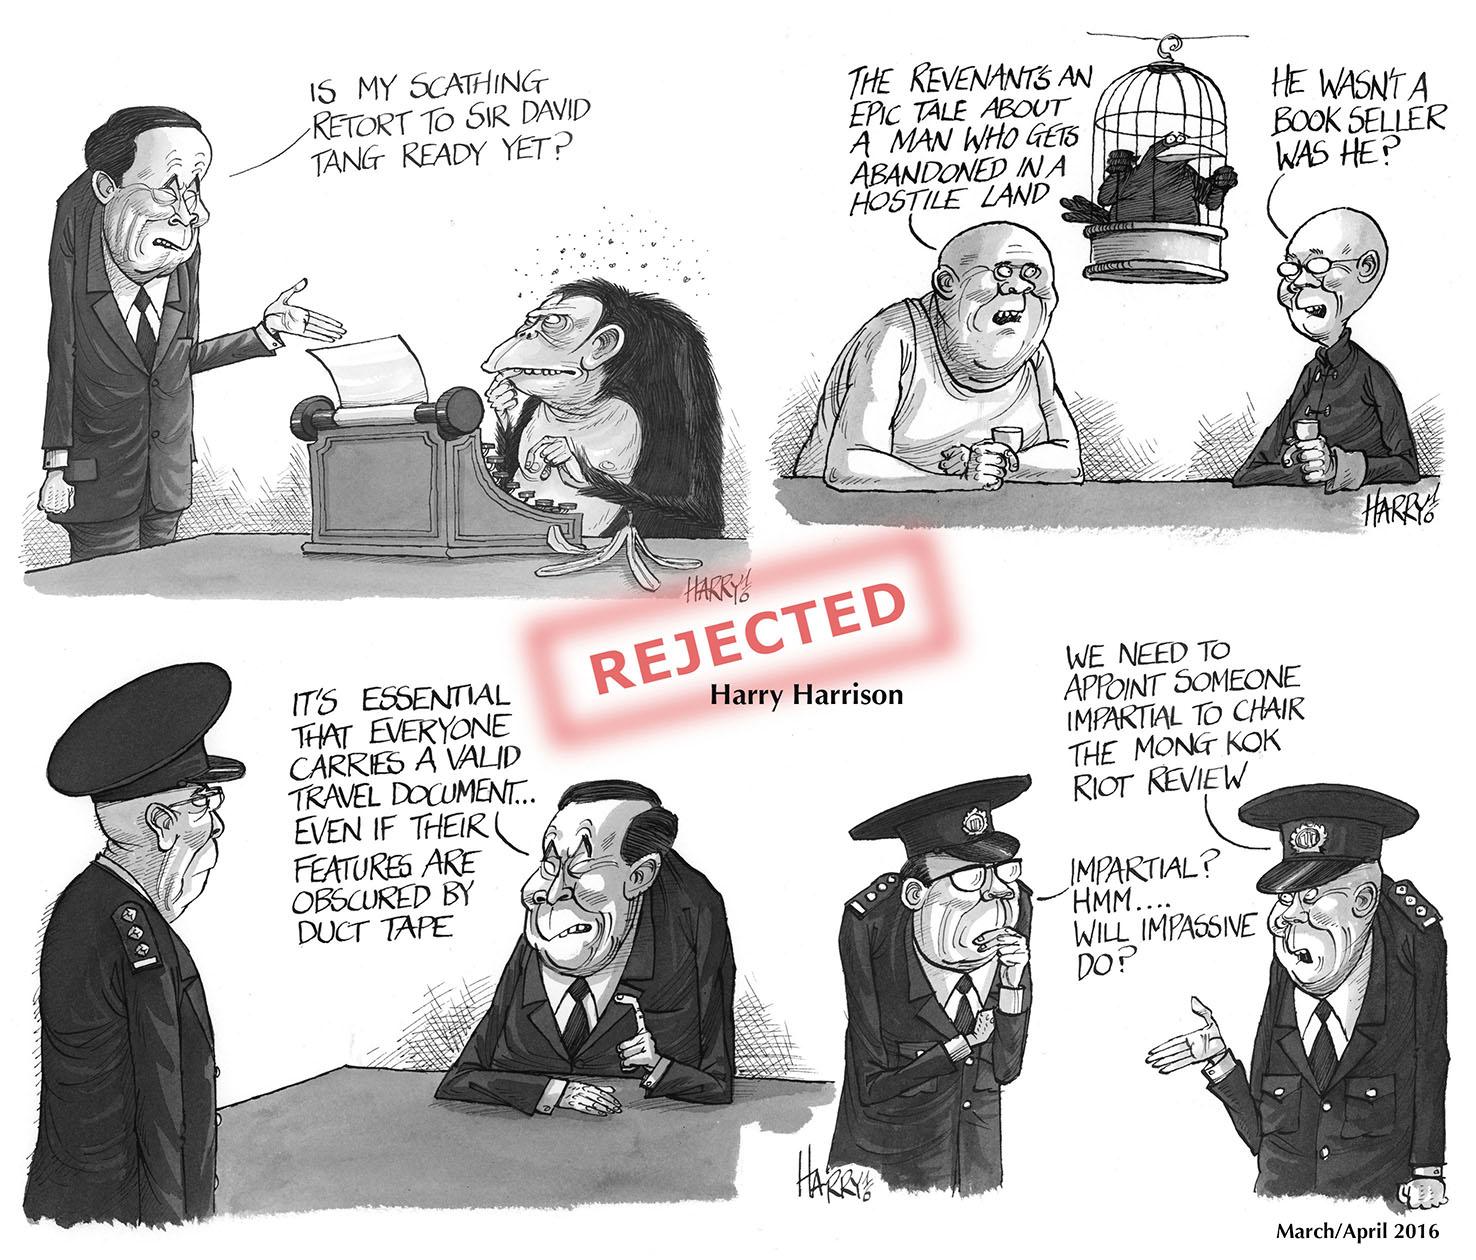 Mar-Apr 2016 Harry's reject